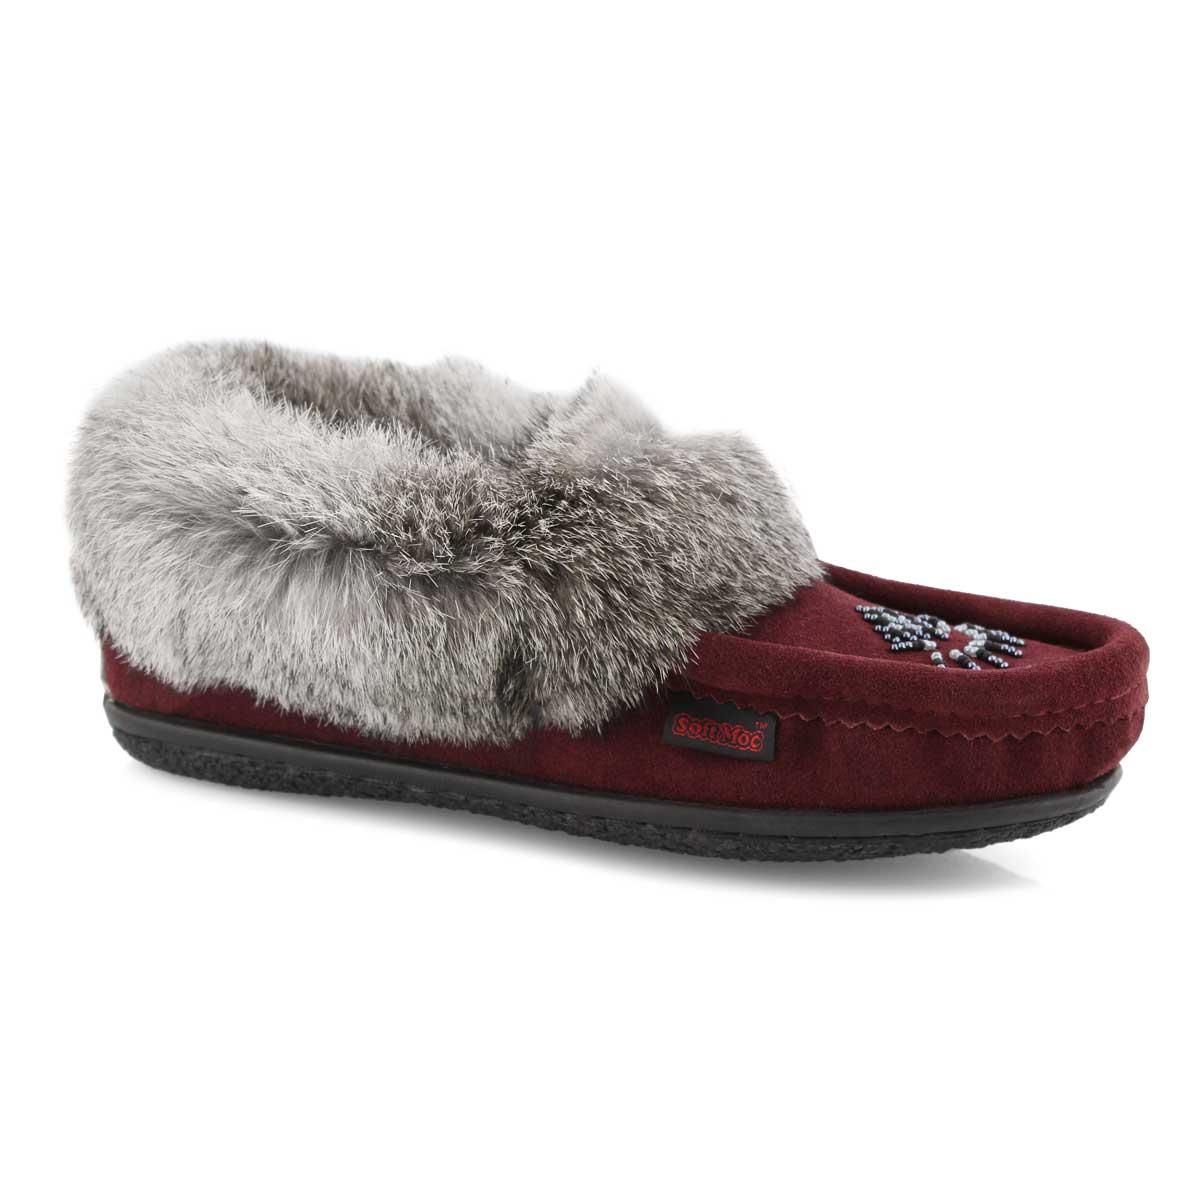 Lds Cute 4 burgundy rabbit fur moccasin